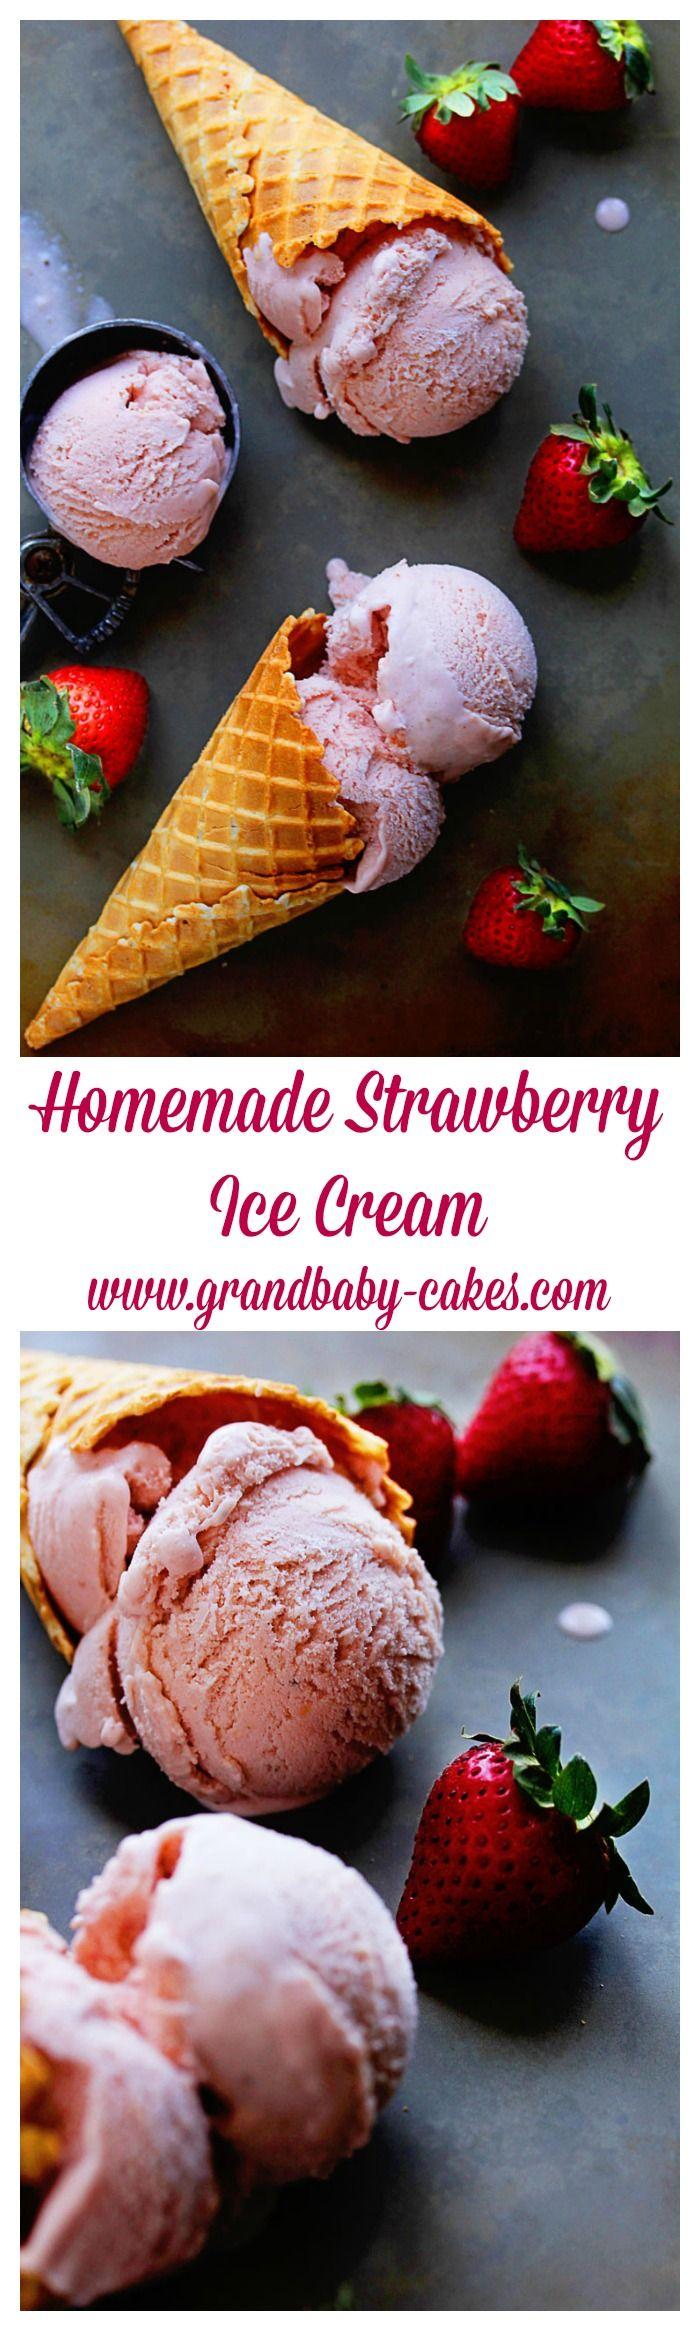 Homemade Strawberry Ice Cream - so luscious, sweet and creamy! ~ http://www.grandbaby-cakes.com